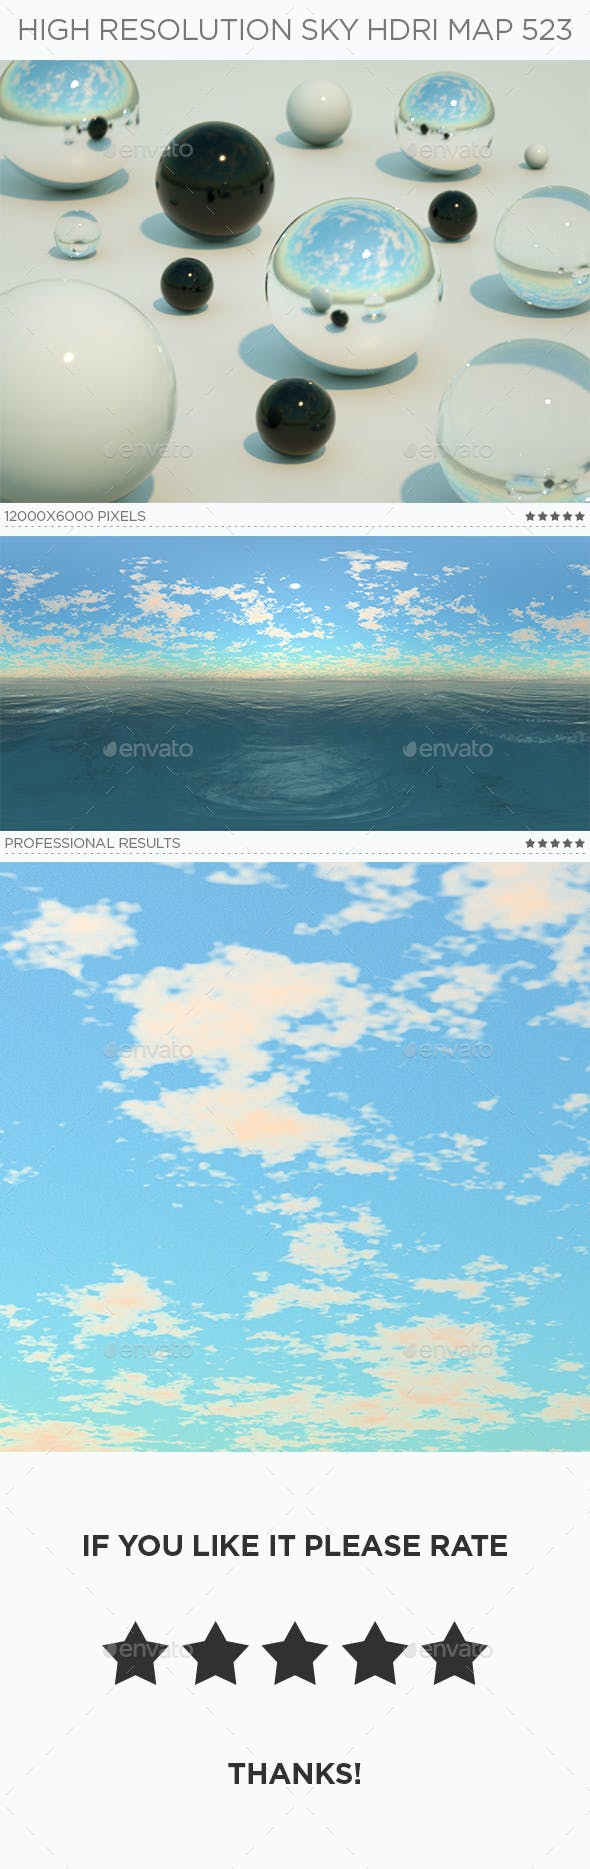 High Resolution Sky HDRi Map 523 - 3DOcean Item for Sale